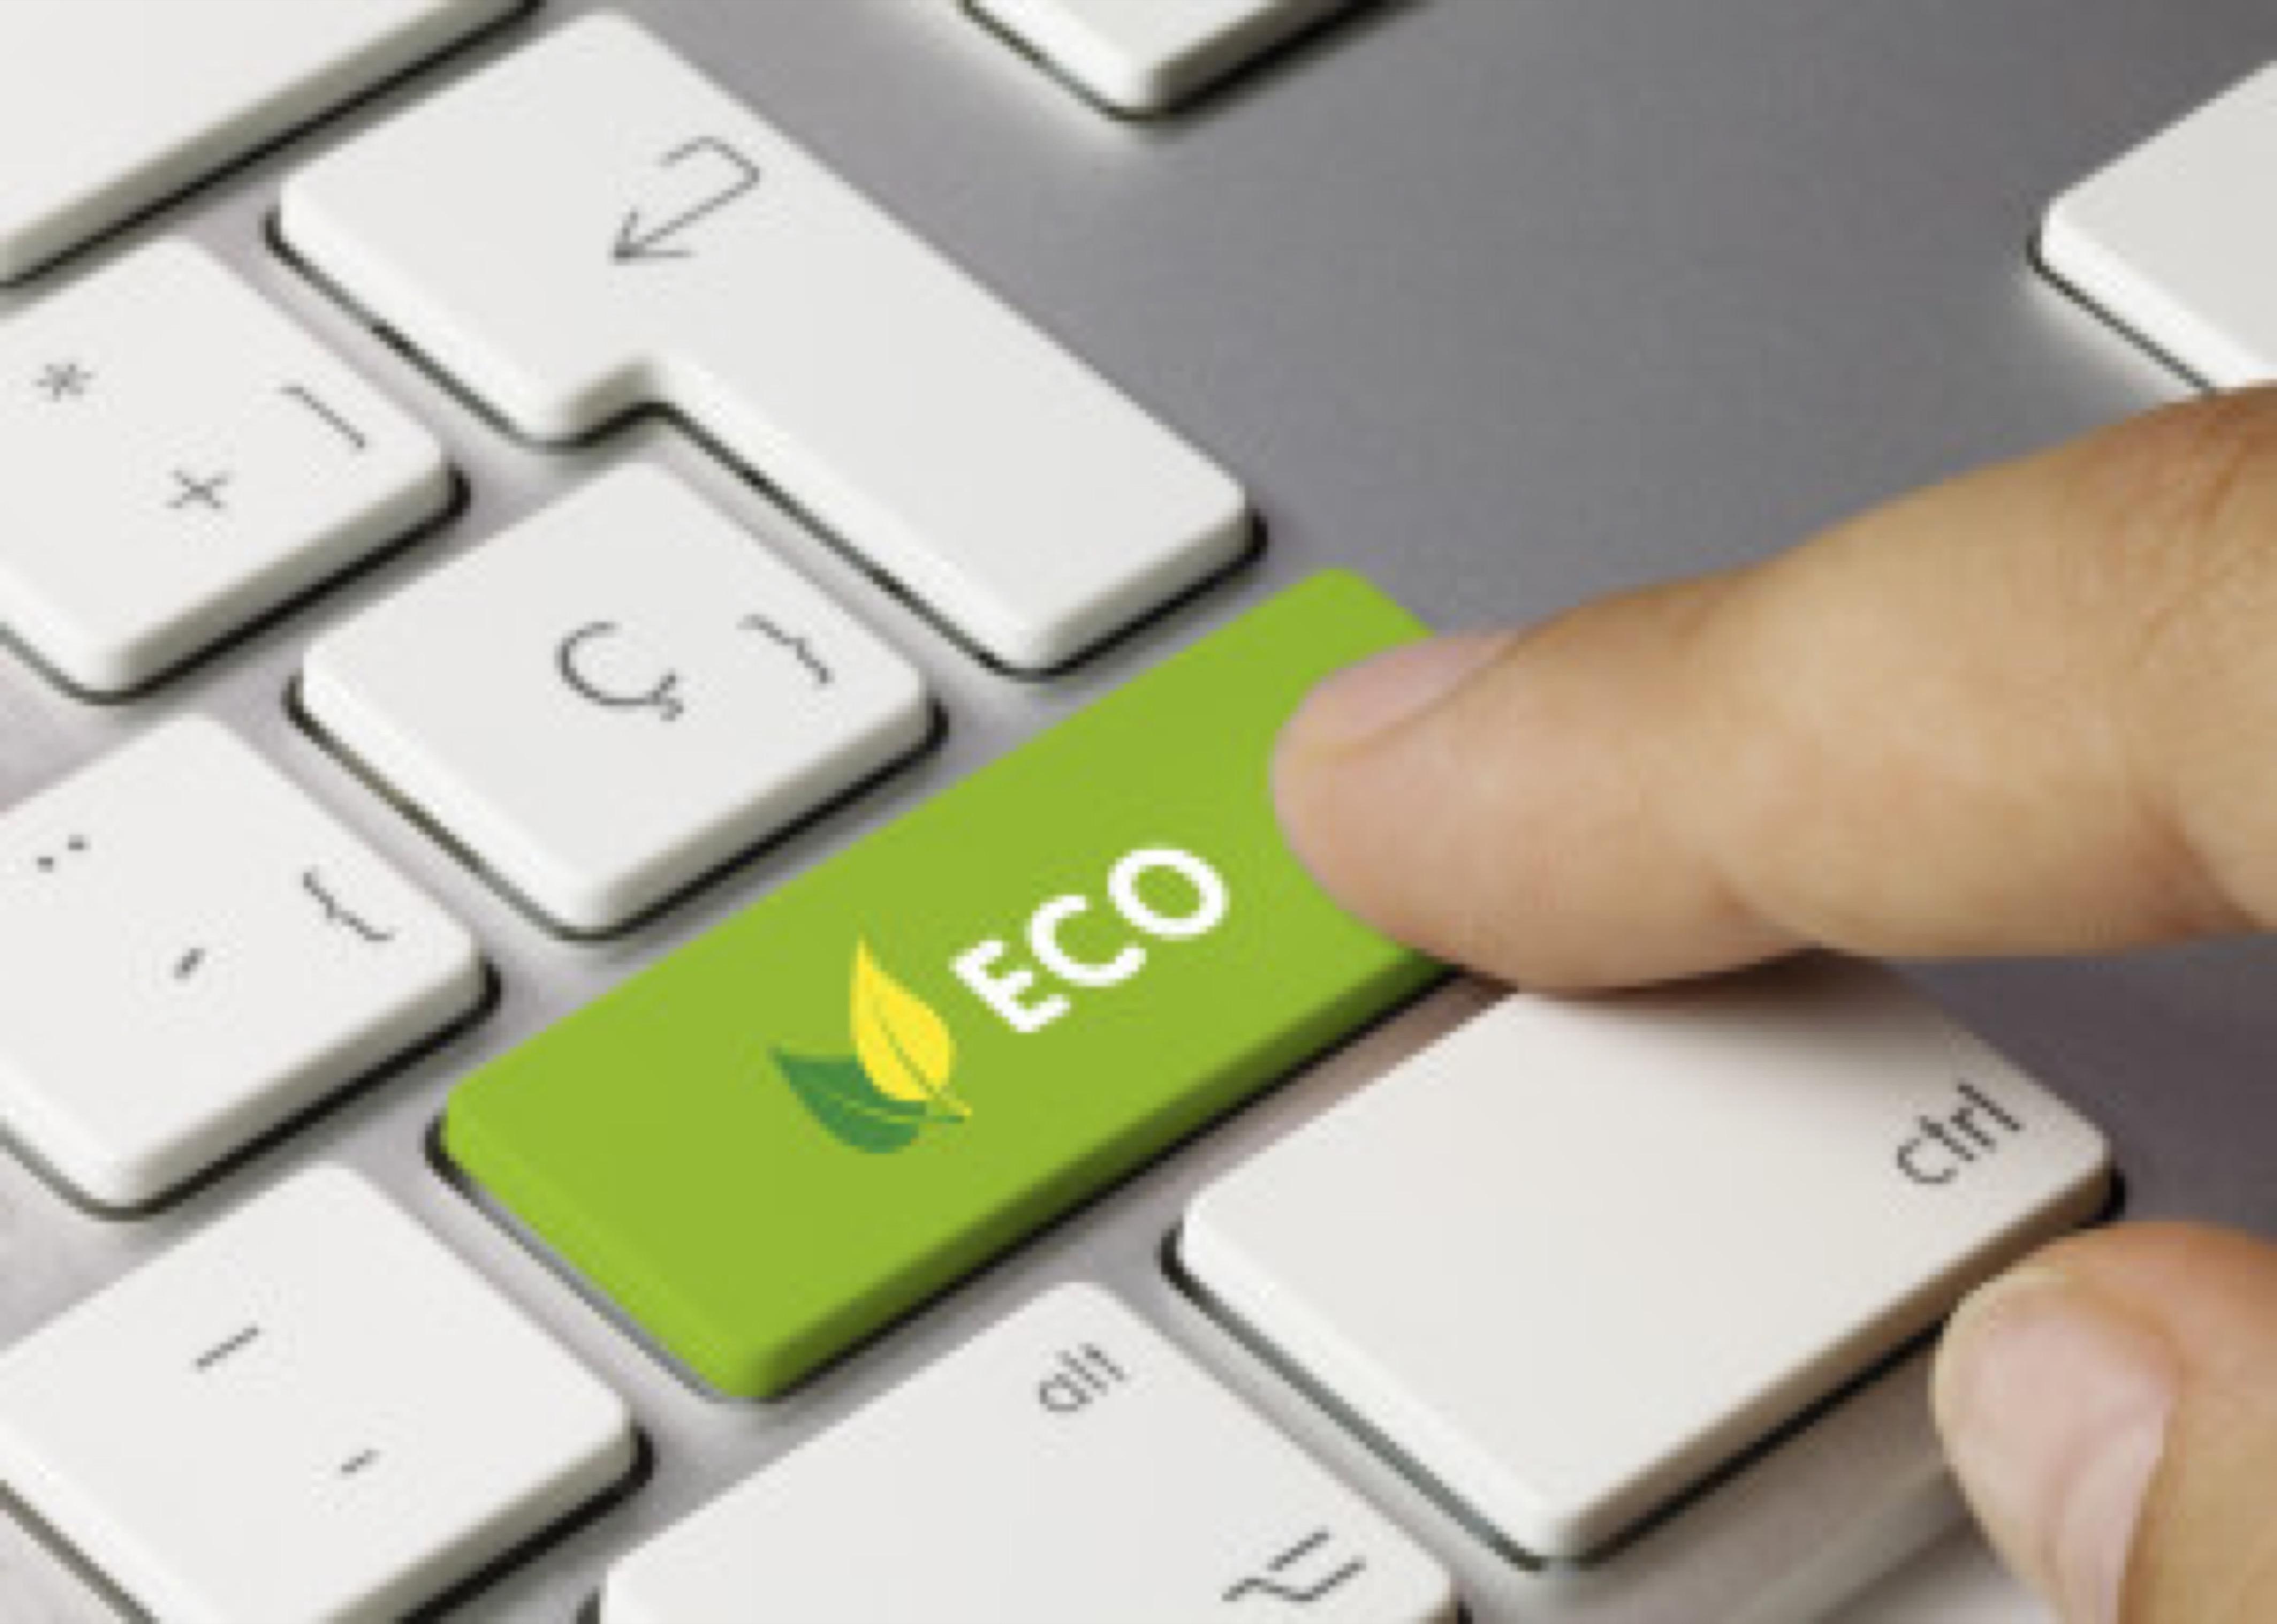 Eco keyboard key. Finger